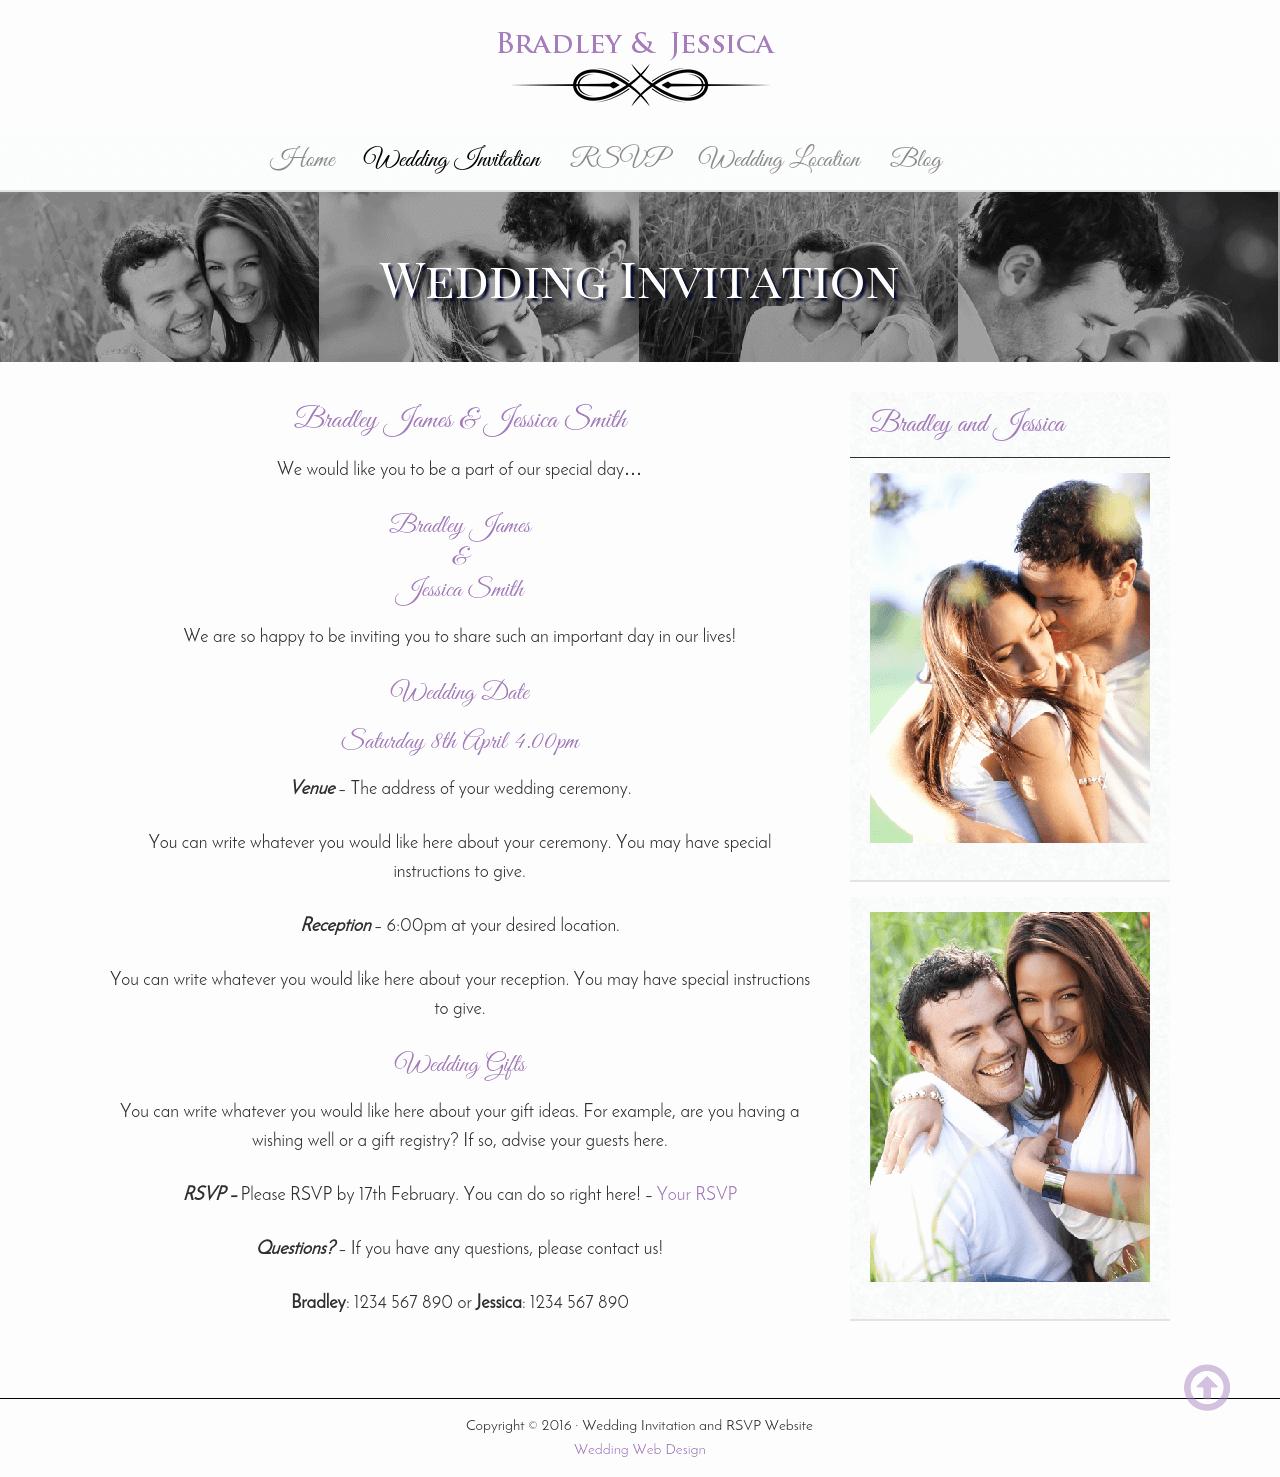 Best Wedding Invitation Sites Awesome Wedding Invitation and Wedding Gallery Websites